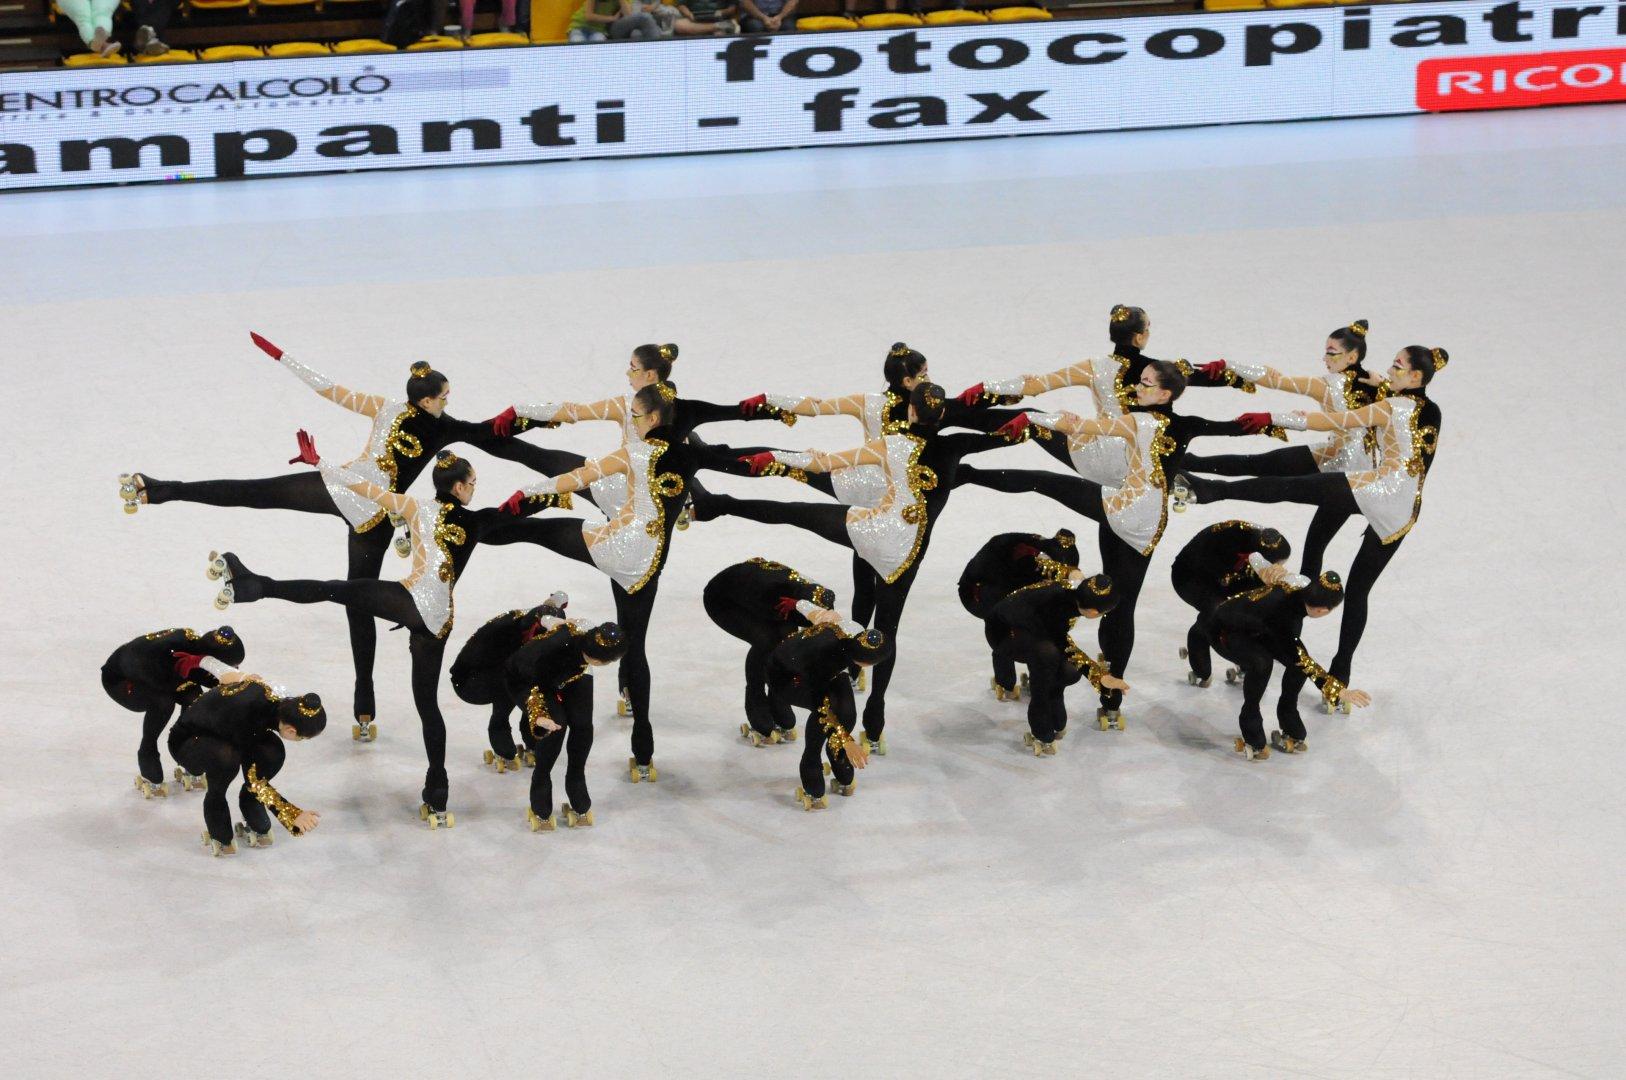 Campionato Europeo Modena 2013 1